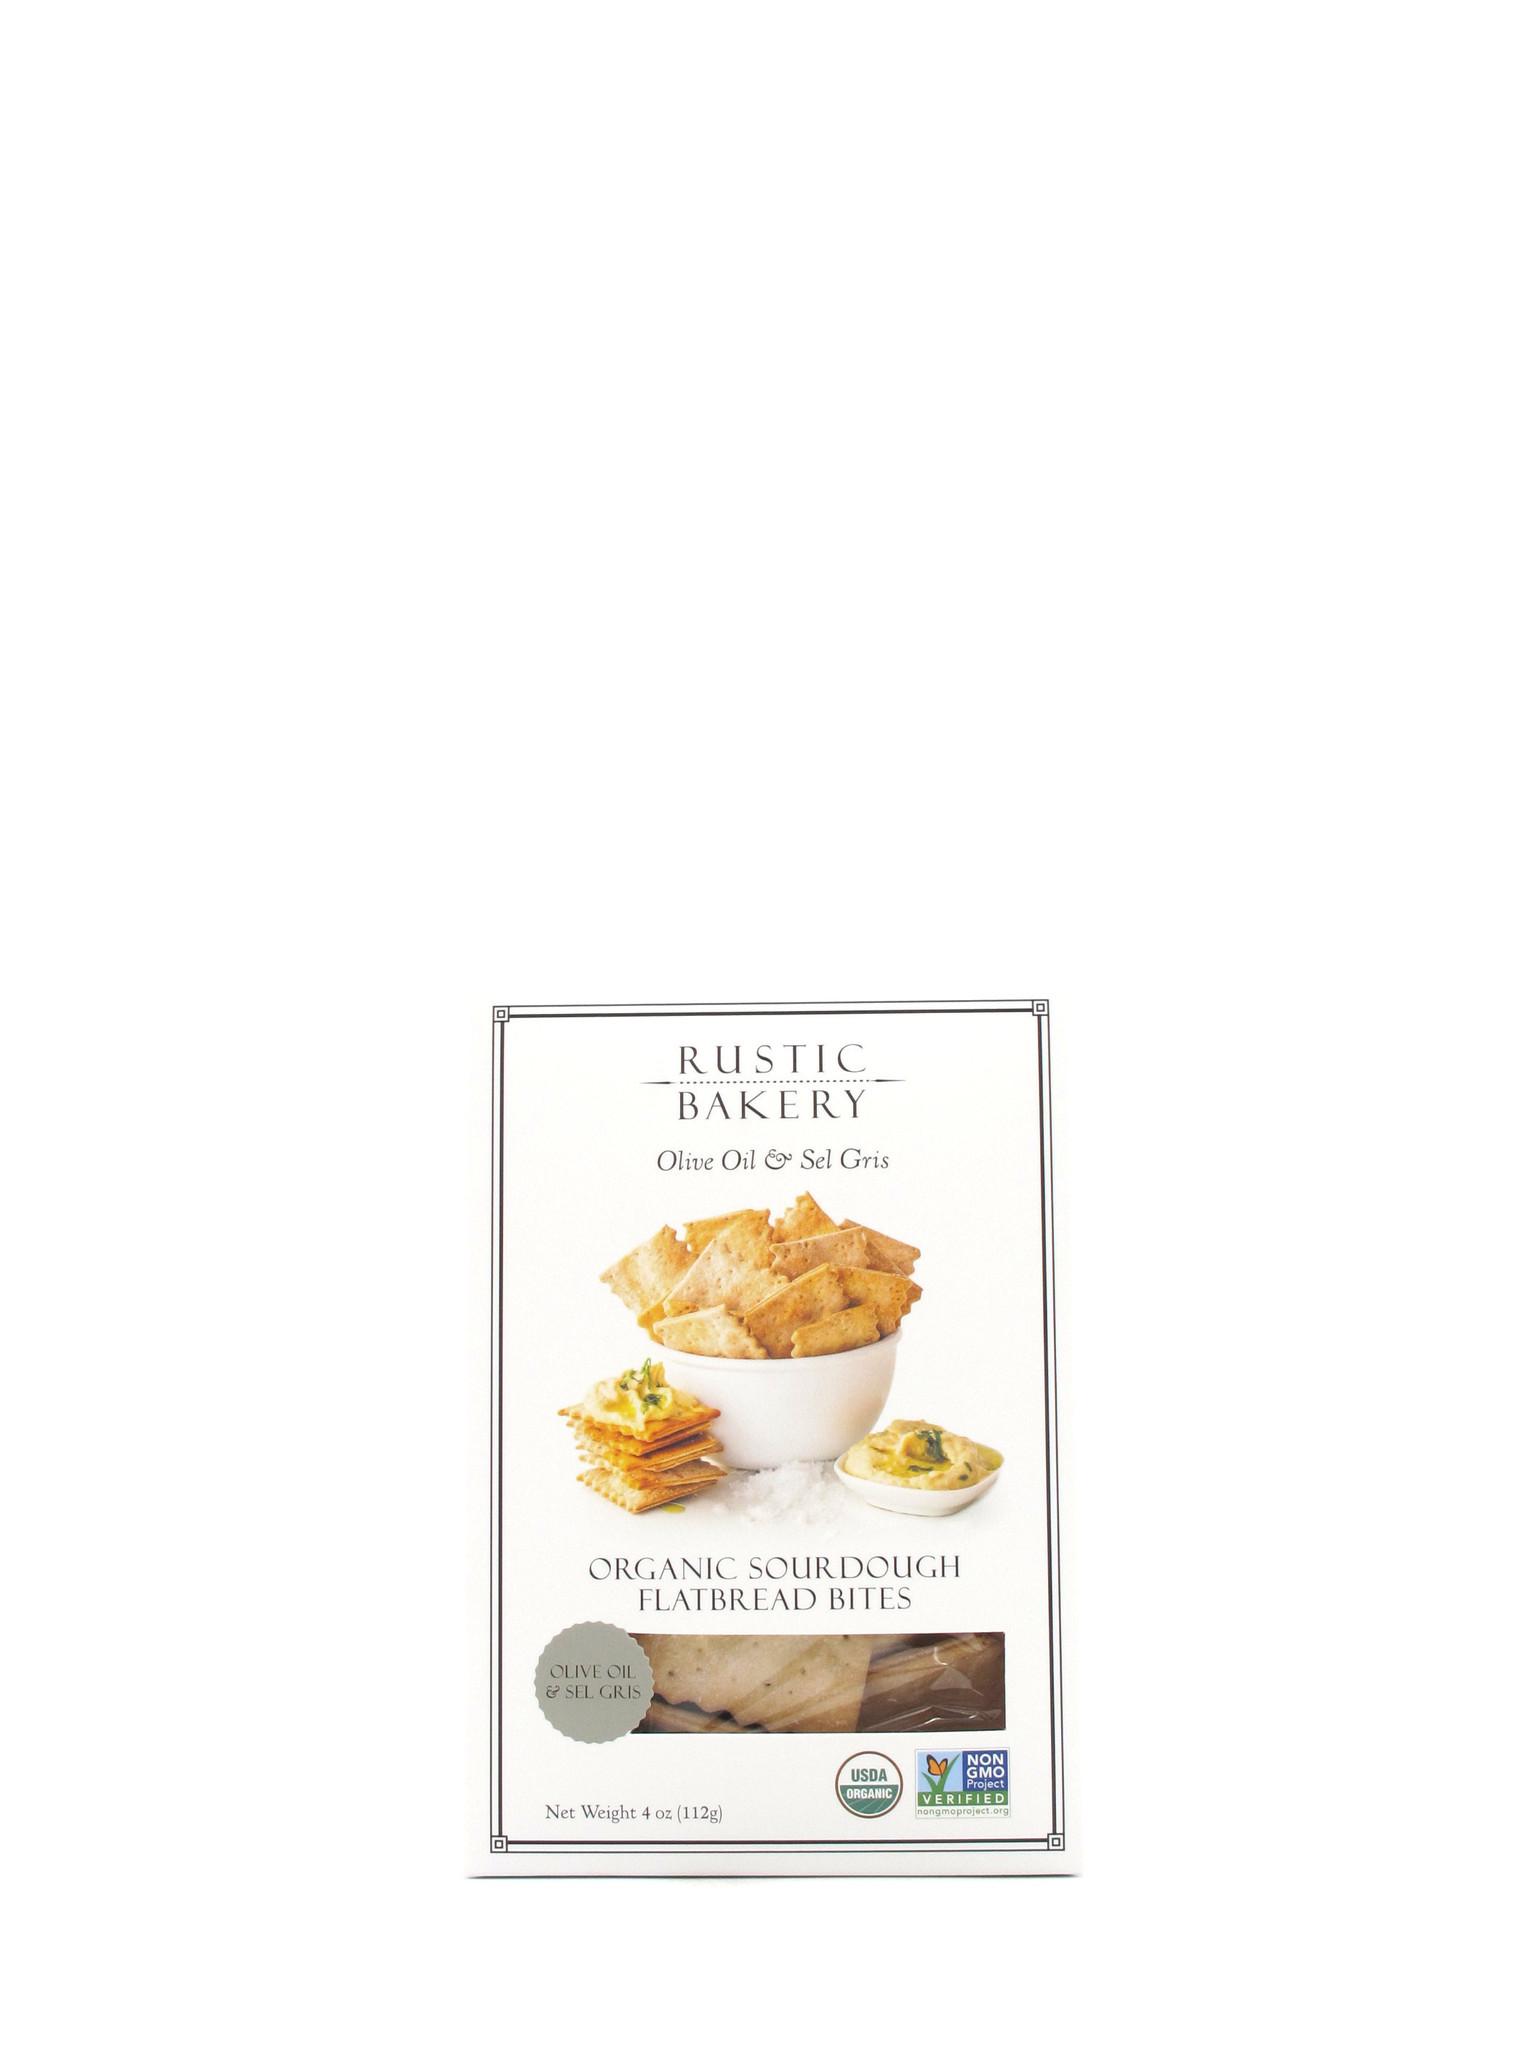 Rustic Bakery Rustic Bakery Olive Oil & Sel Gris Flatbread Bites 4oz